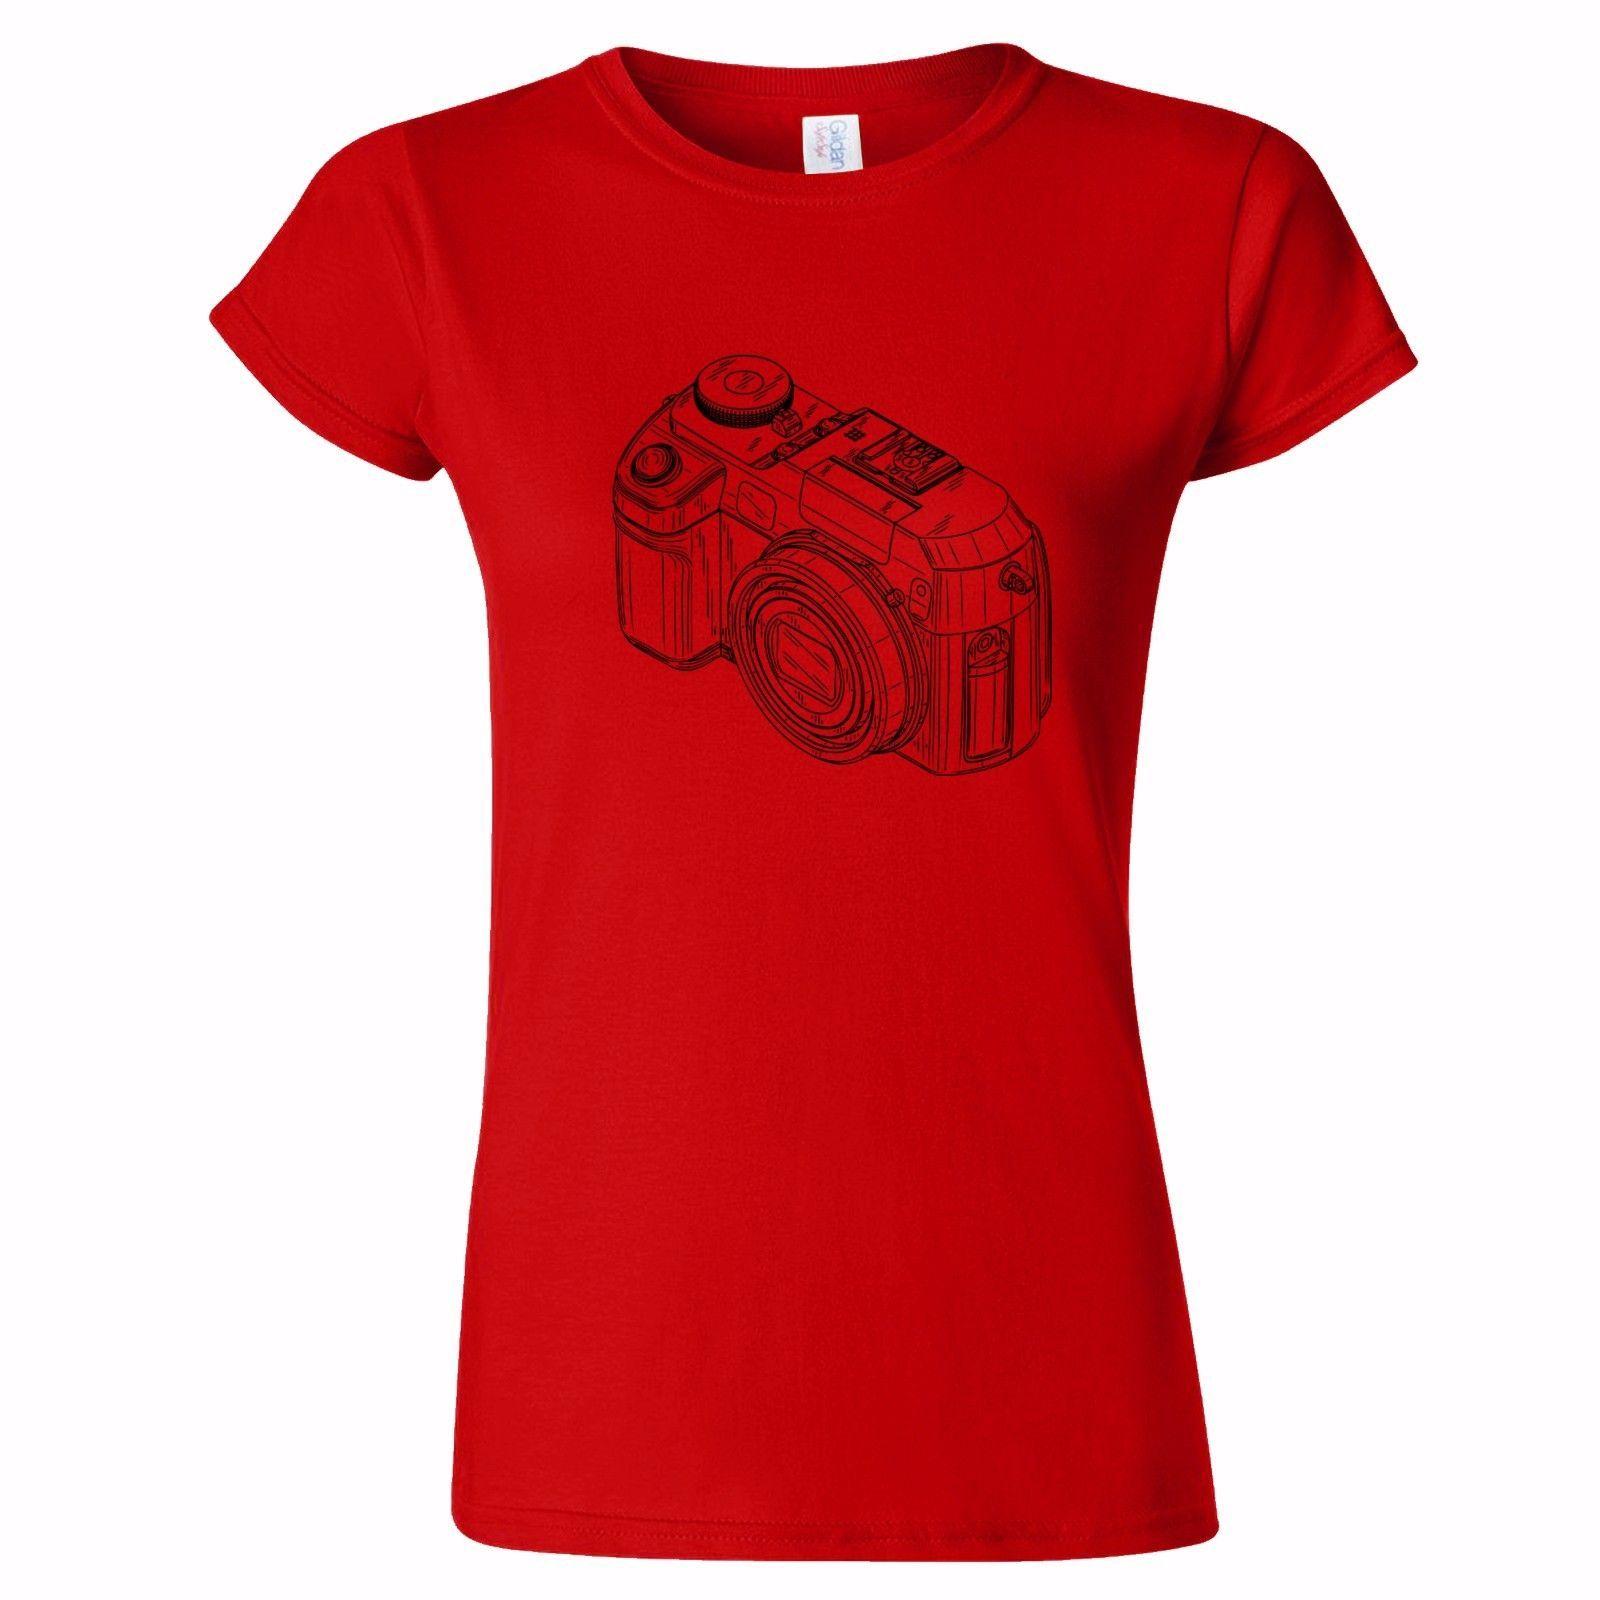 7237928978 DIGITAL CAMERA SKETCH WOMENS T SHIRT PHOTOGRAPHY PHOTOGRAPHER GIFT PRESENT  Shop T Shirts Online T Shirt Shirt From Bangtidyclothing, $10.9| DHgate.Com